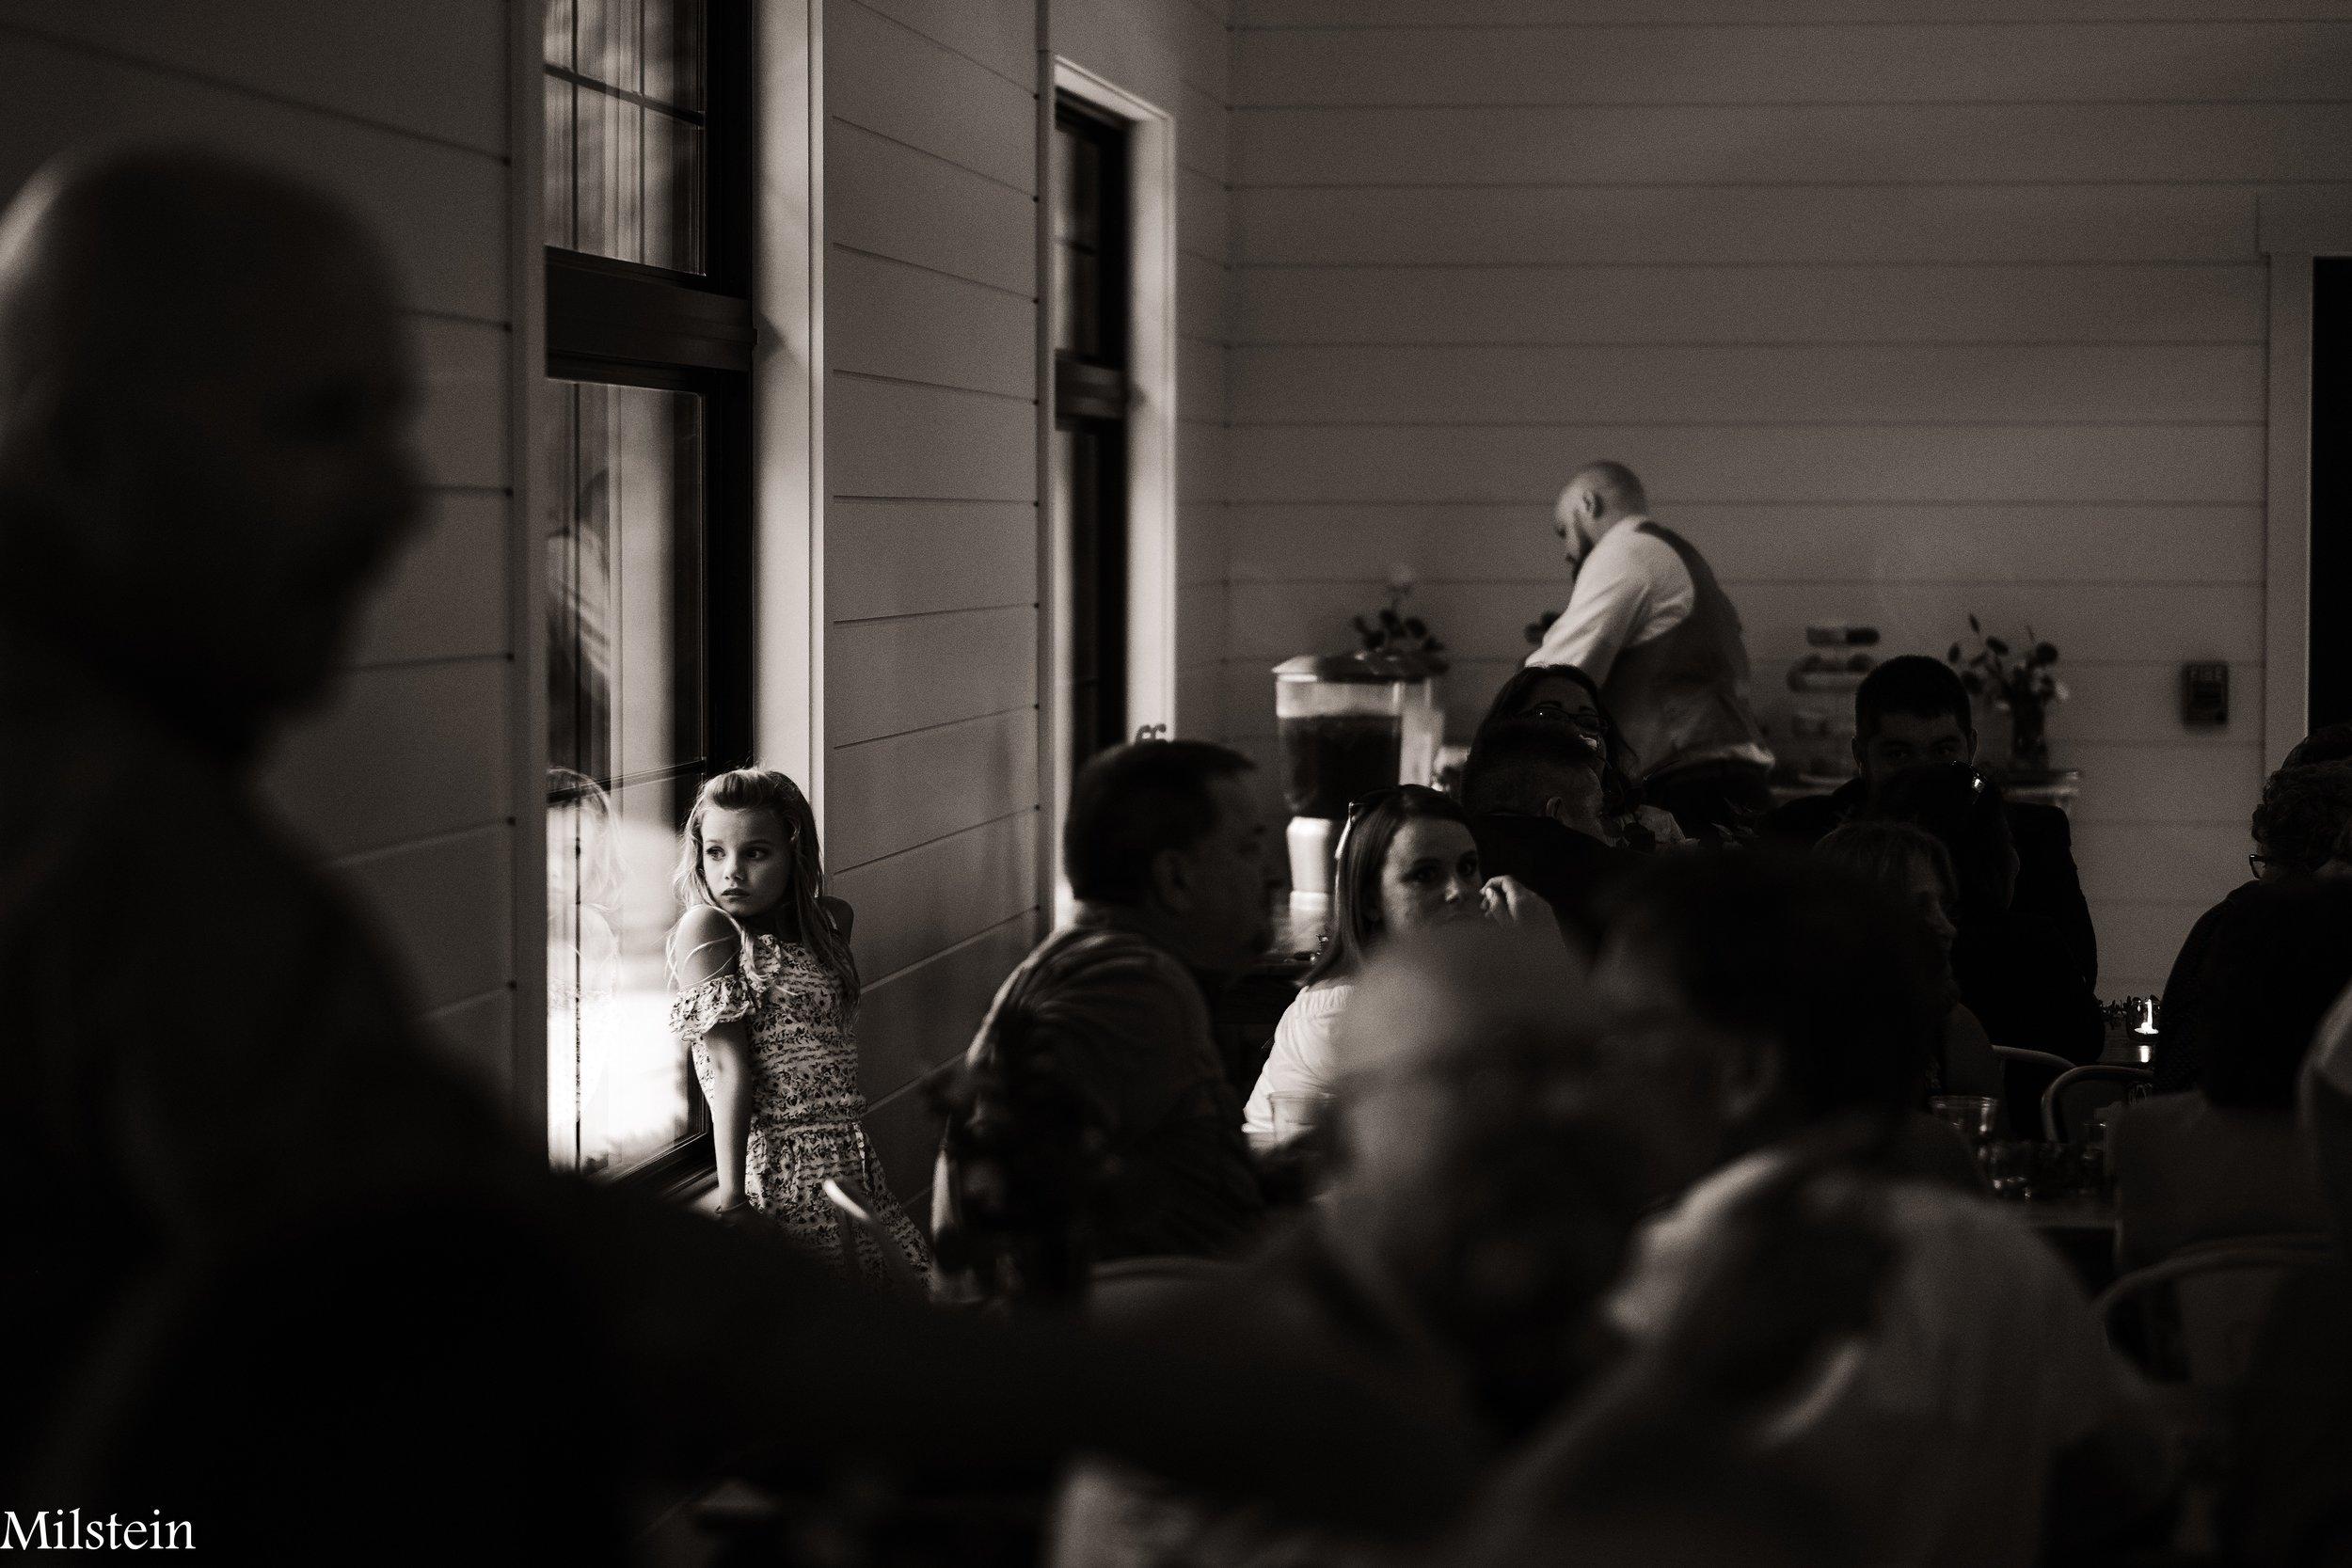 Amy-Milstein-Wedding-Photographer-New-York-Documentary.jpg